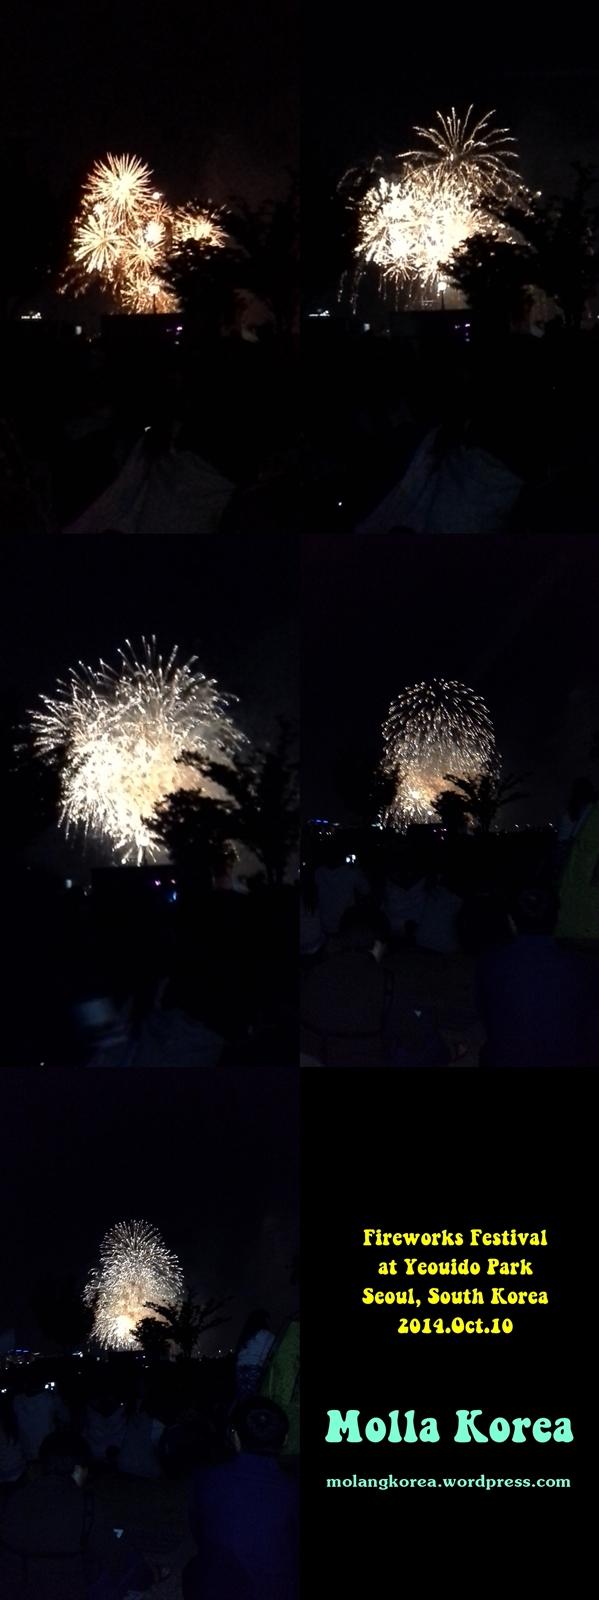 20141004_yeouido park fireworks seoul molangkorea